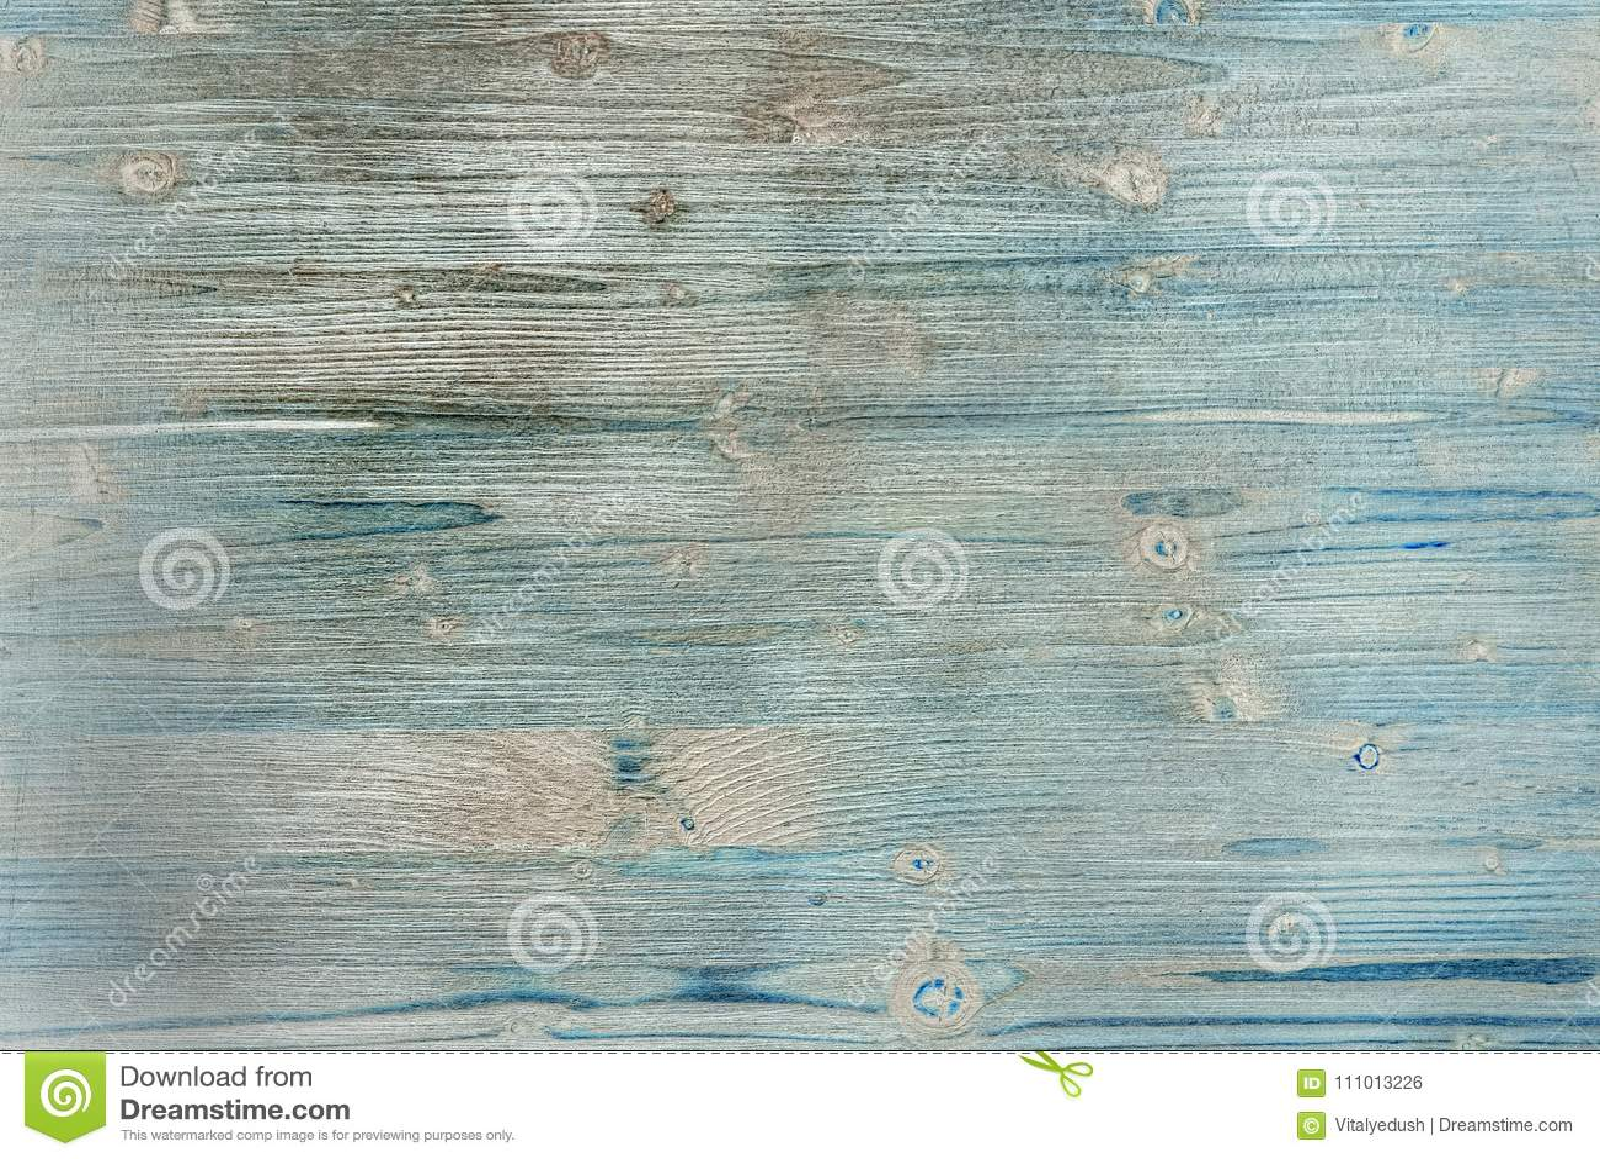 Rustic Barn Wood Art Texture Wallpaper Background